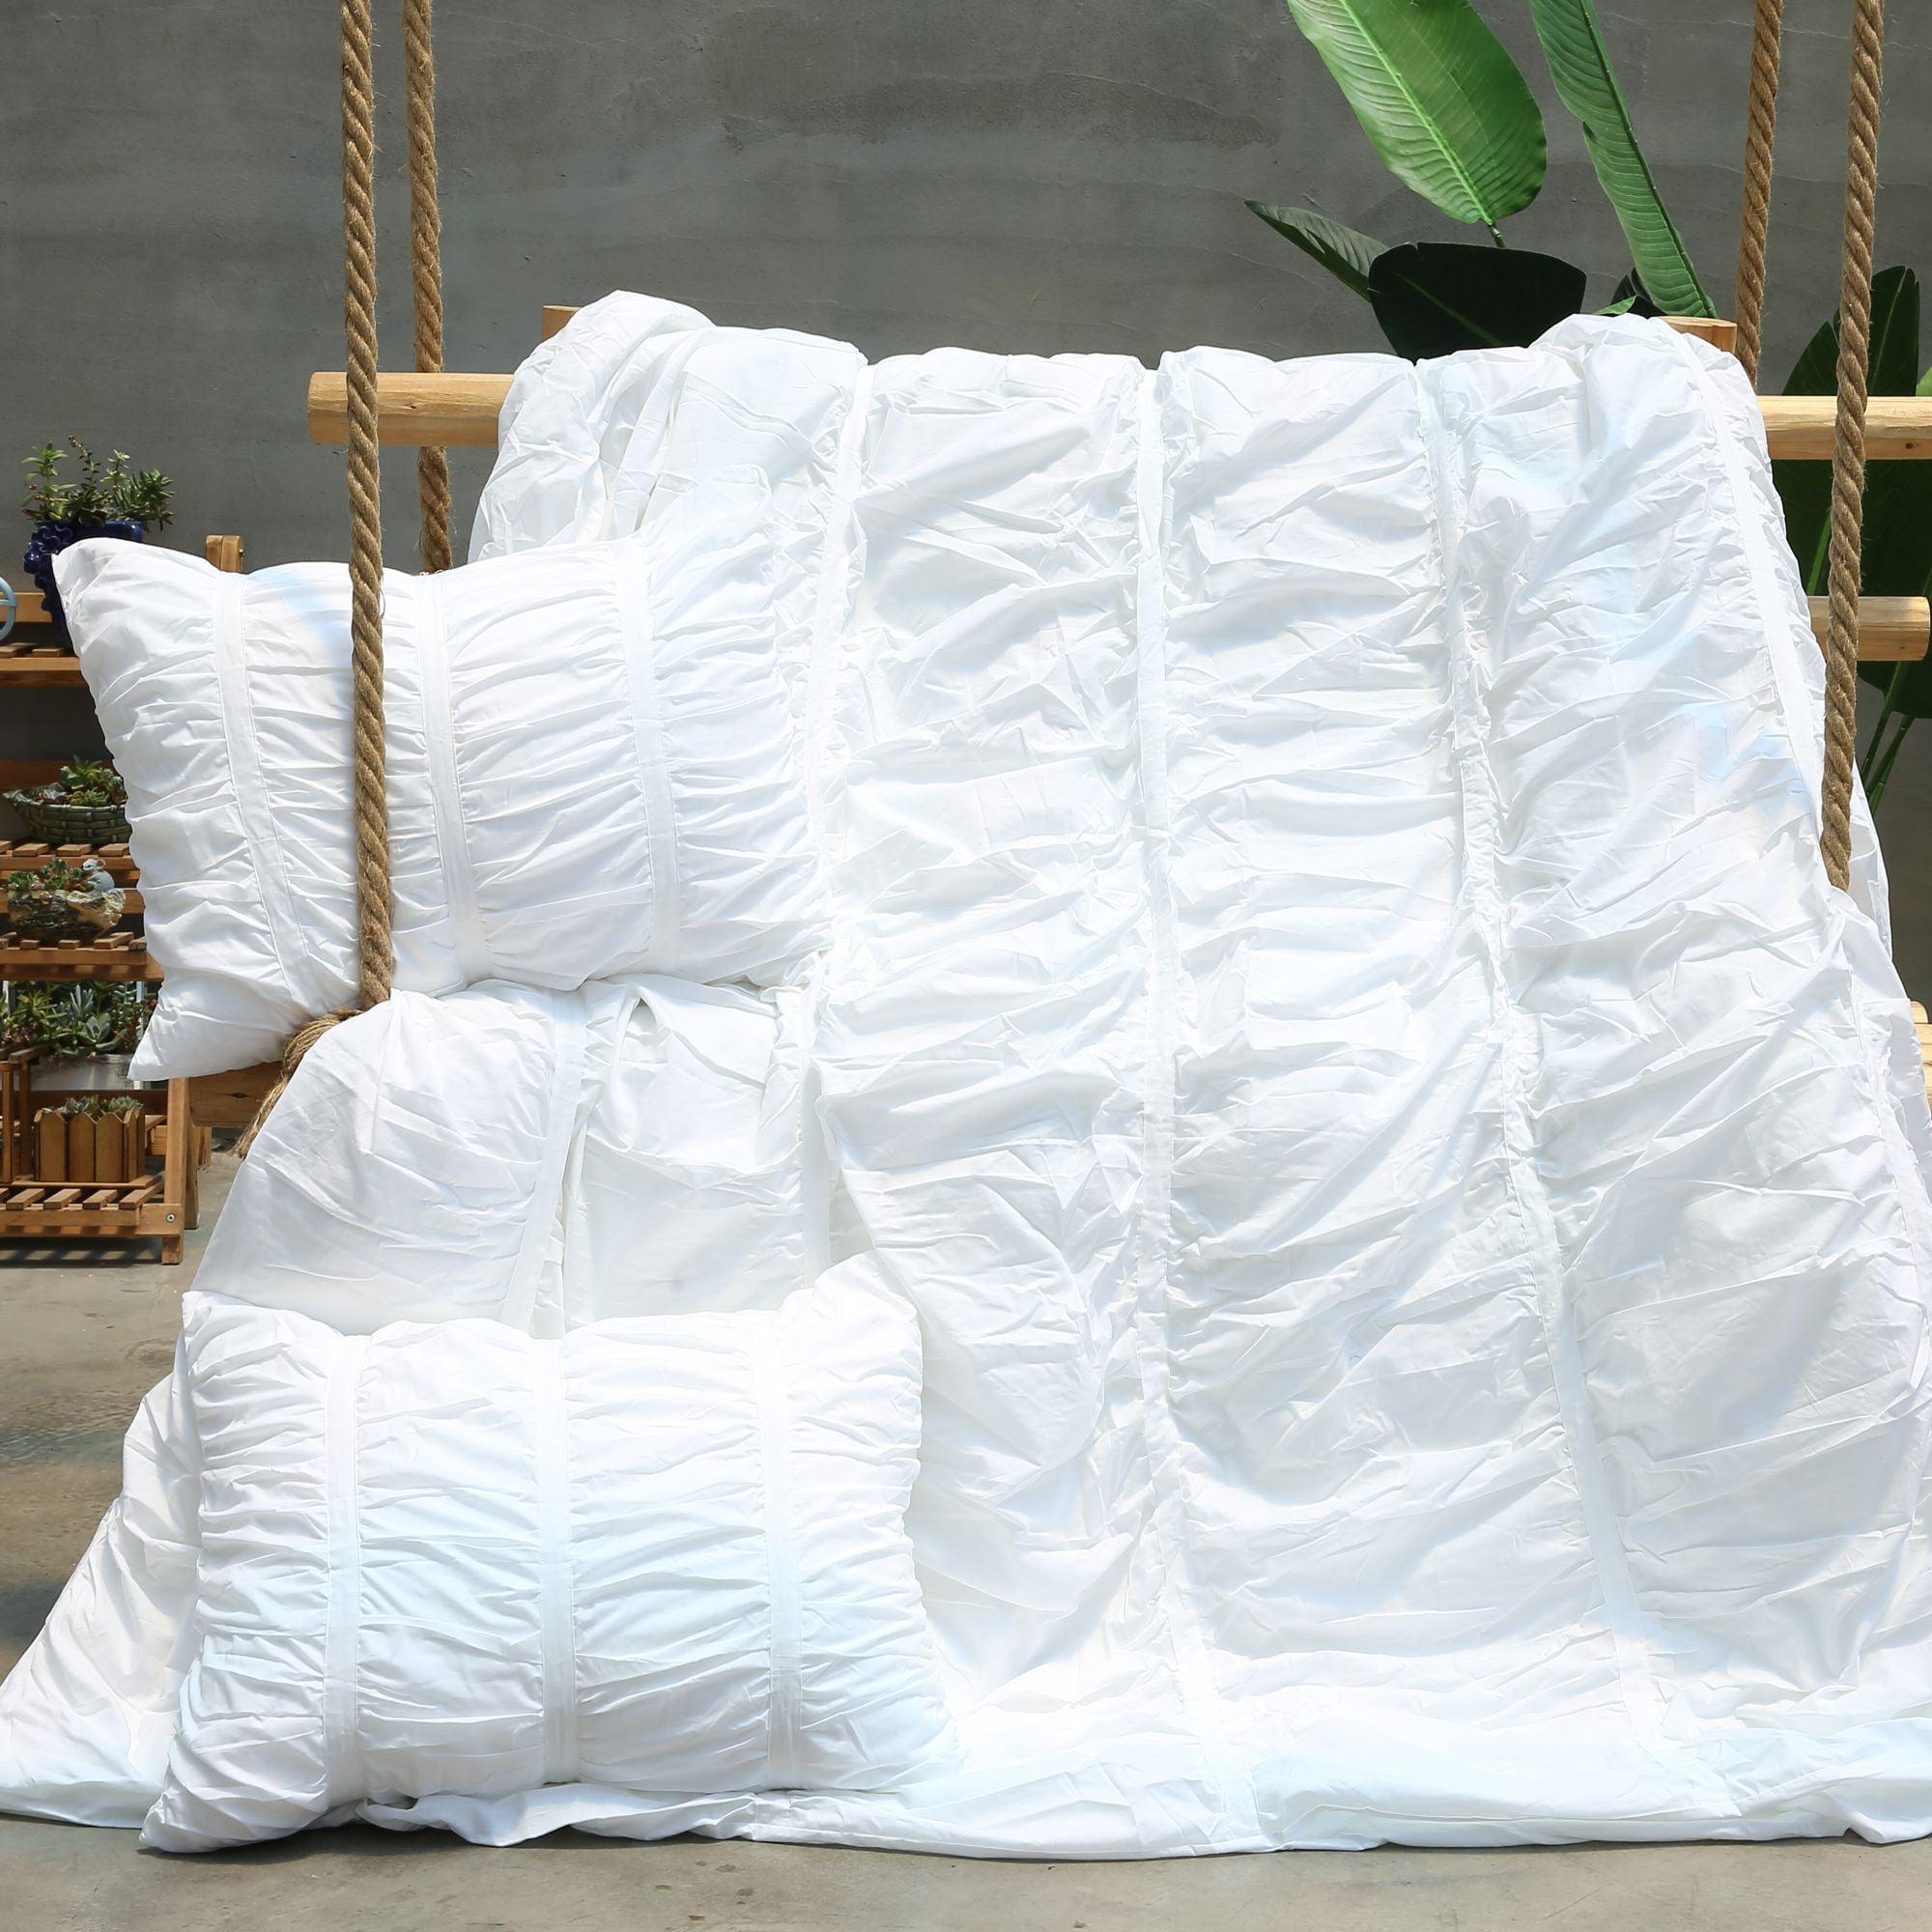 California Design Den Ruffle Duvet Cover Set Cotton Bright White, Full/Queen 3-Piece